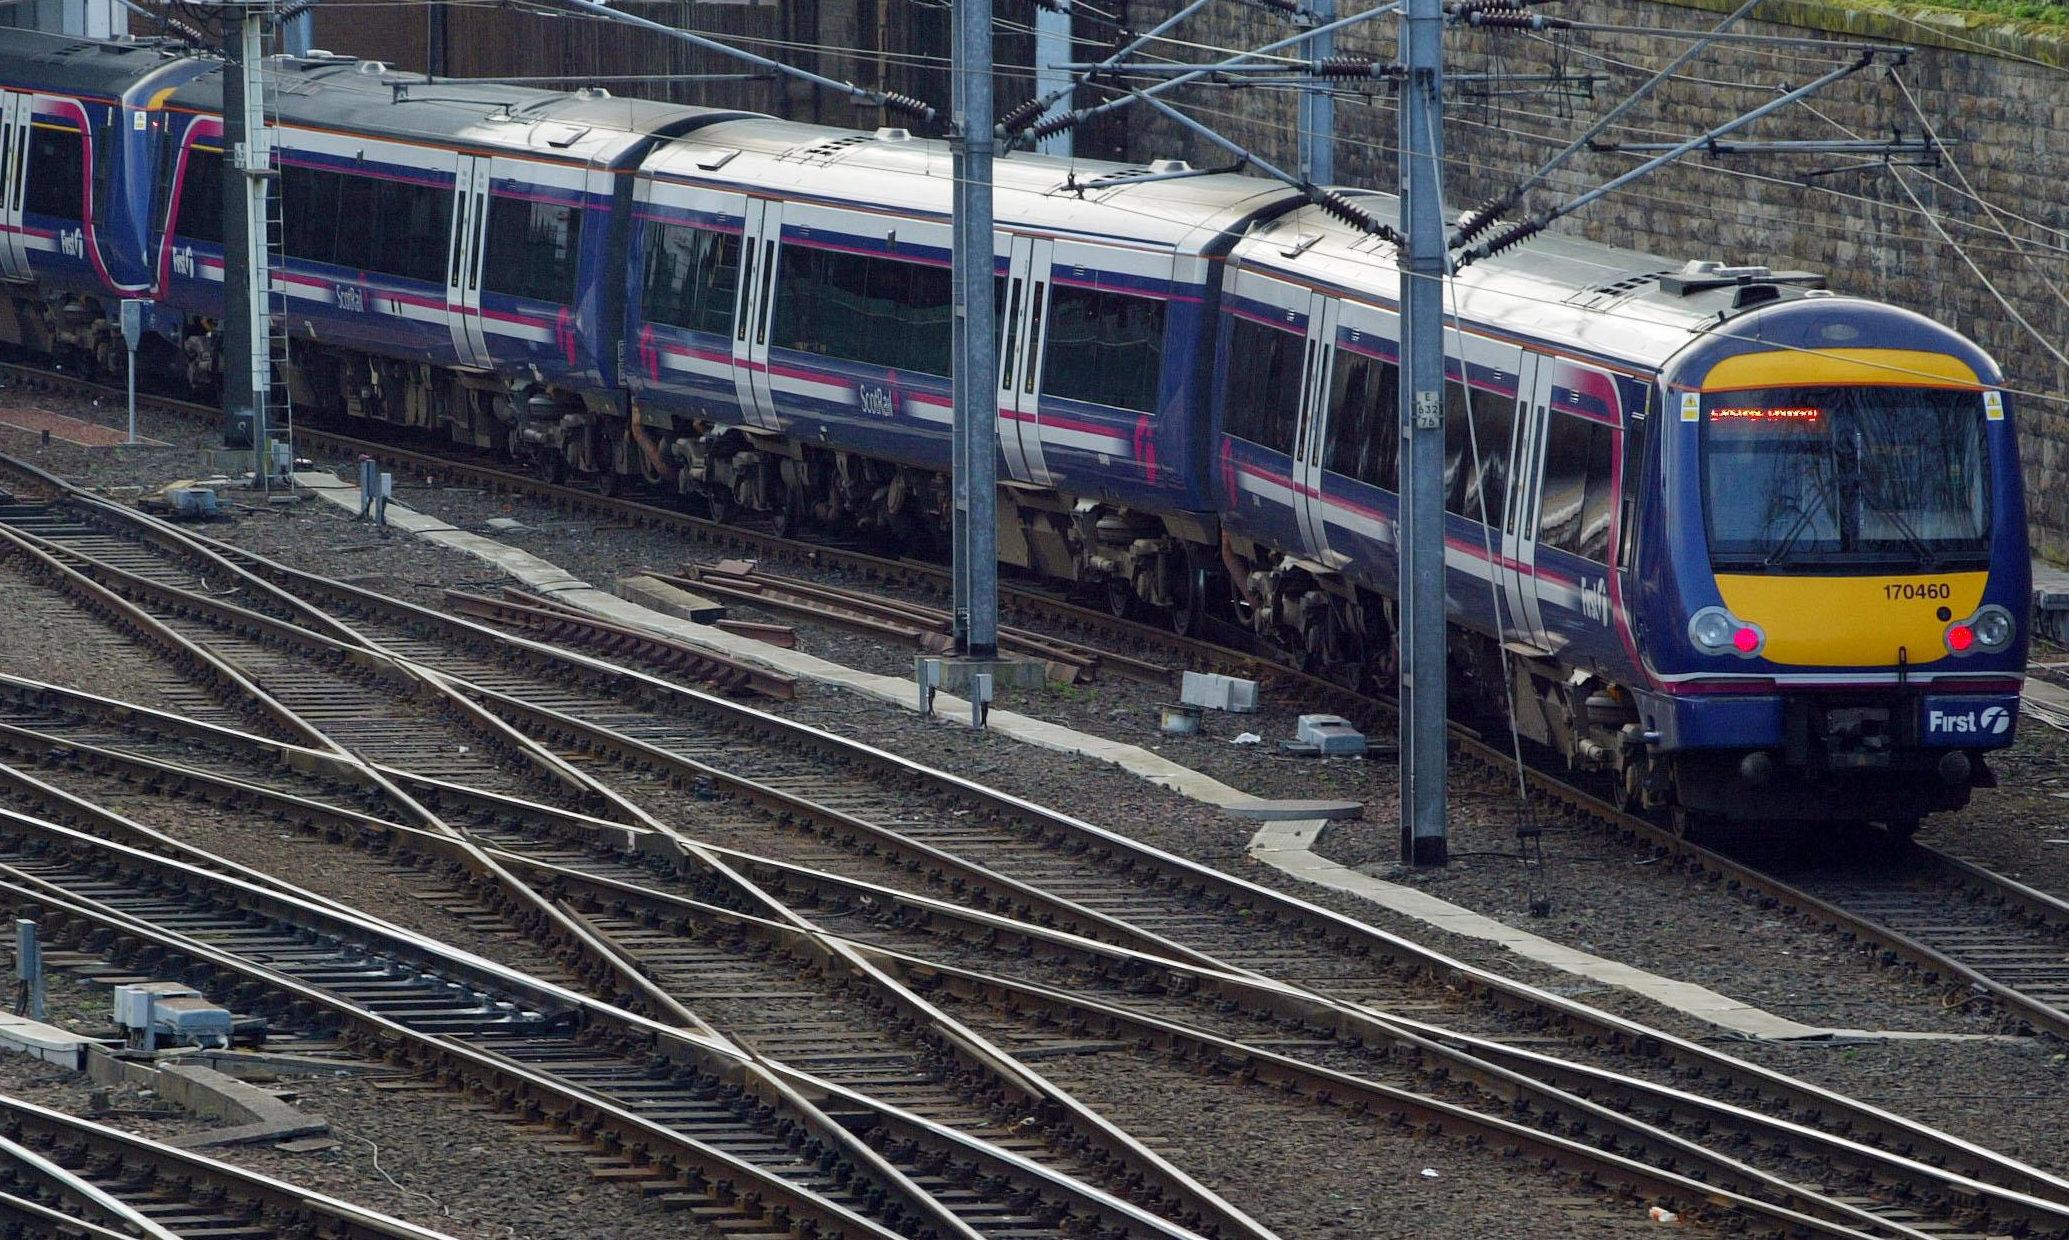 A Scotrail train arrives at Edinburgh Waverley Station.